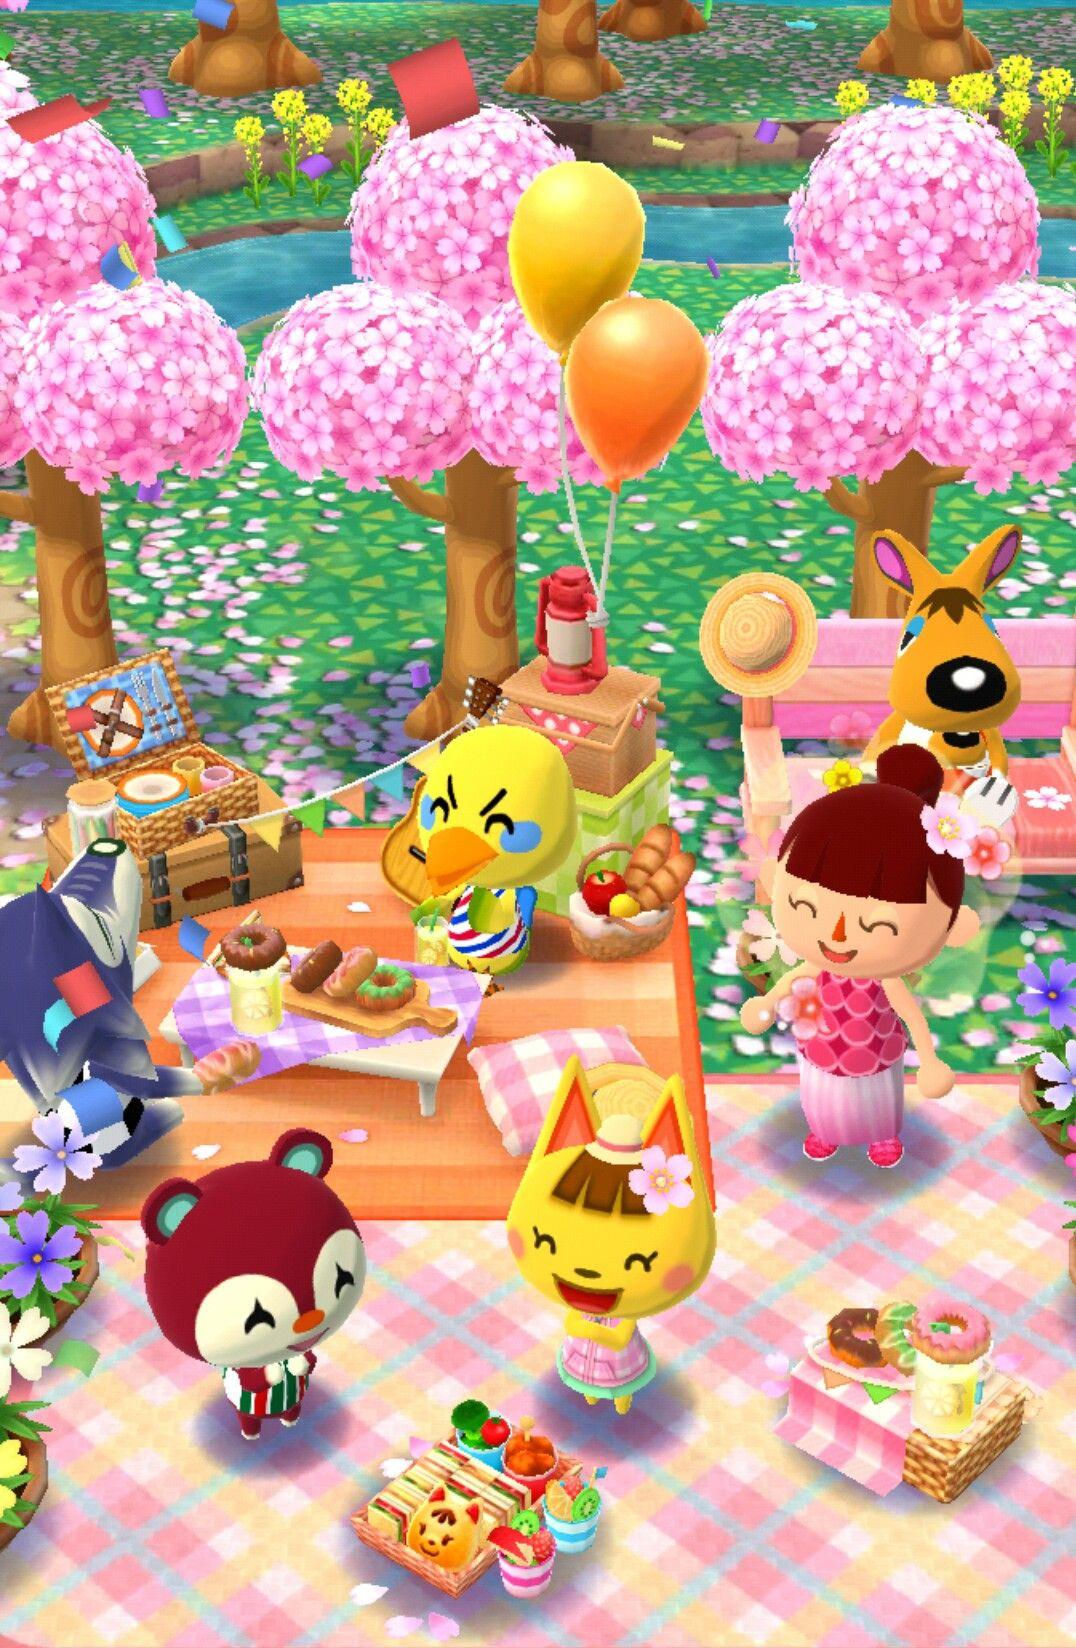 Pinky Animal Crossing Sticker | Etsy